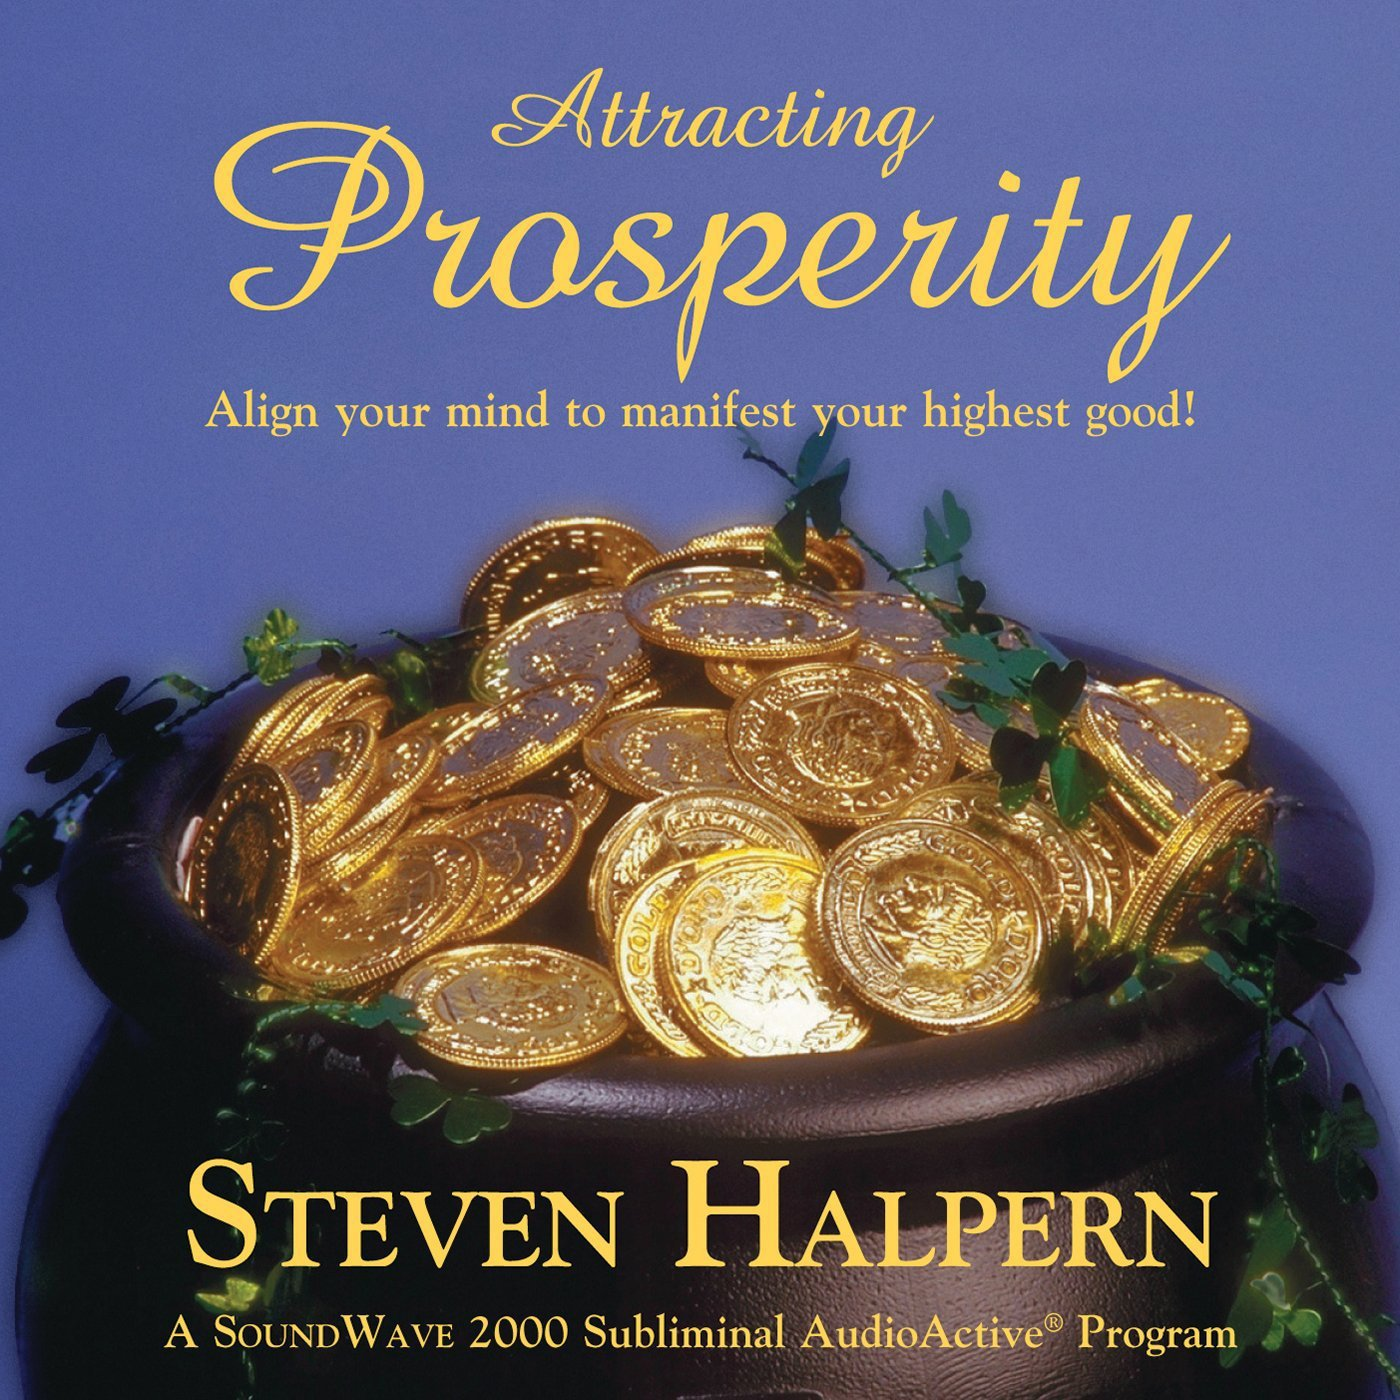 Attracting Prosperity...